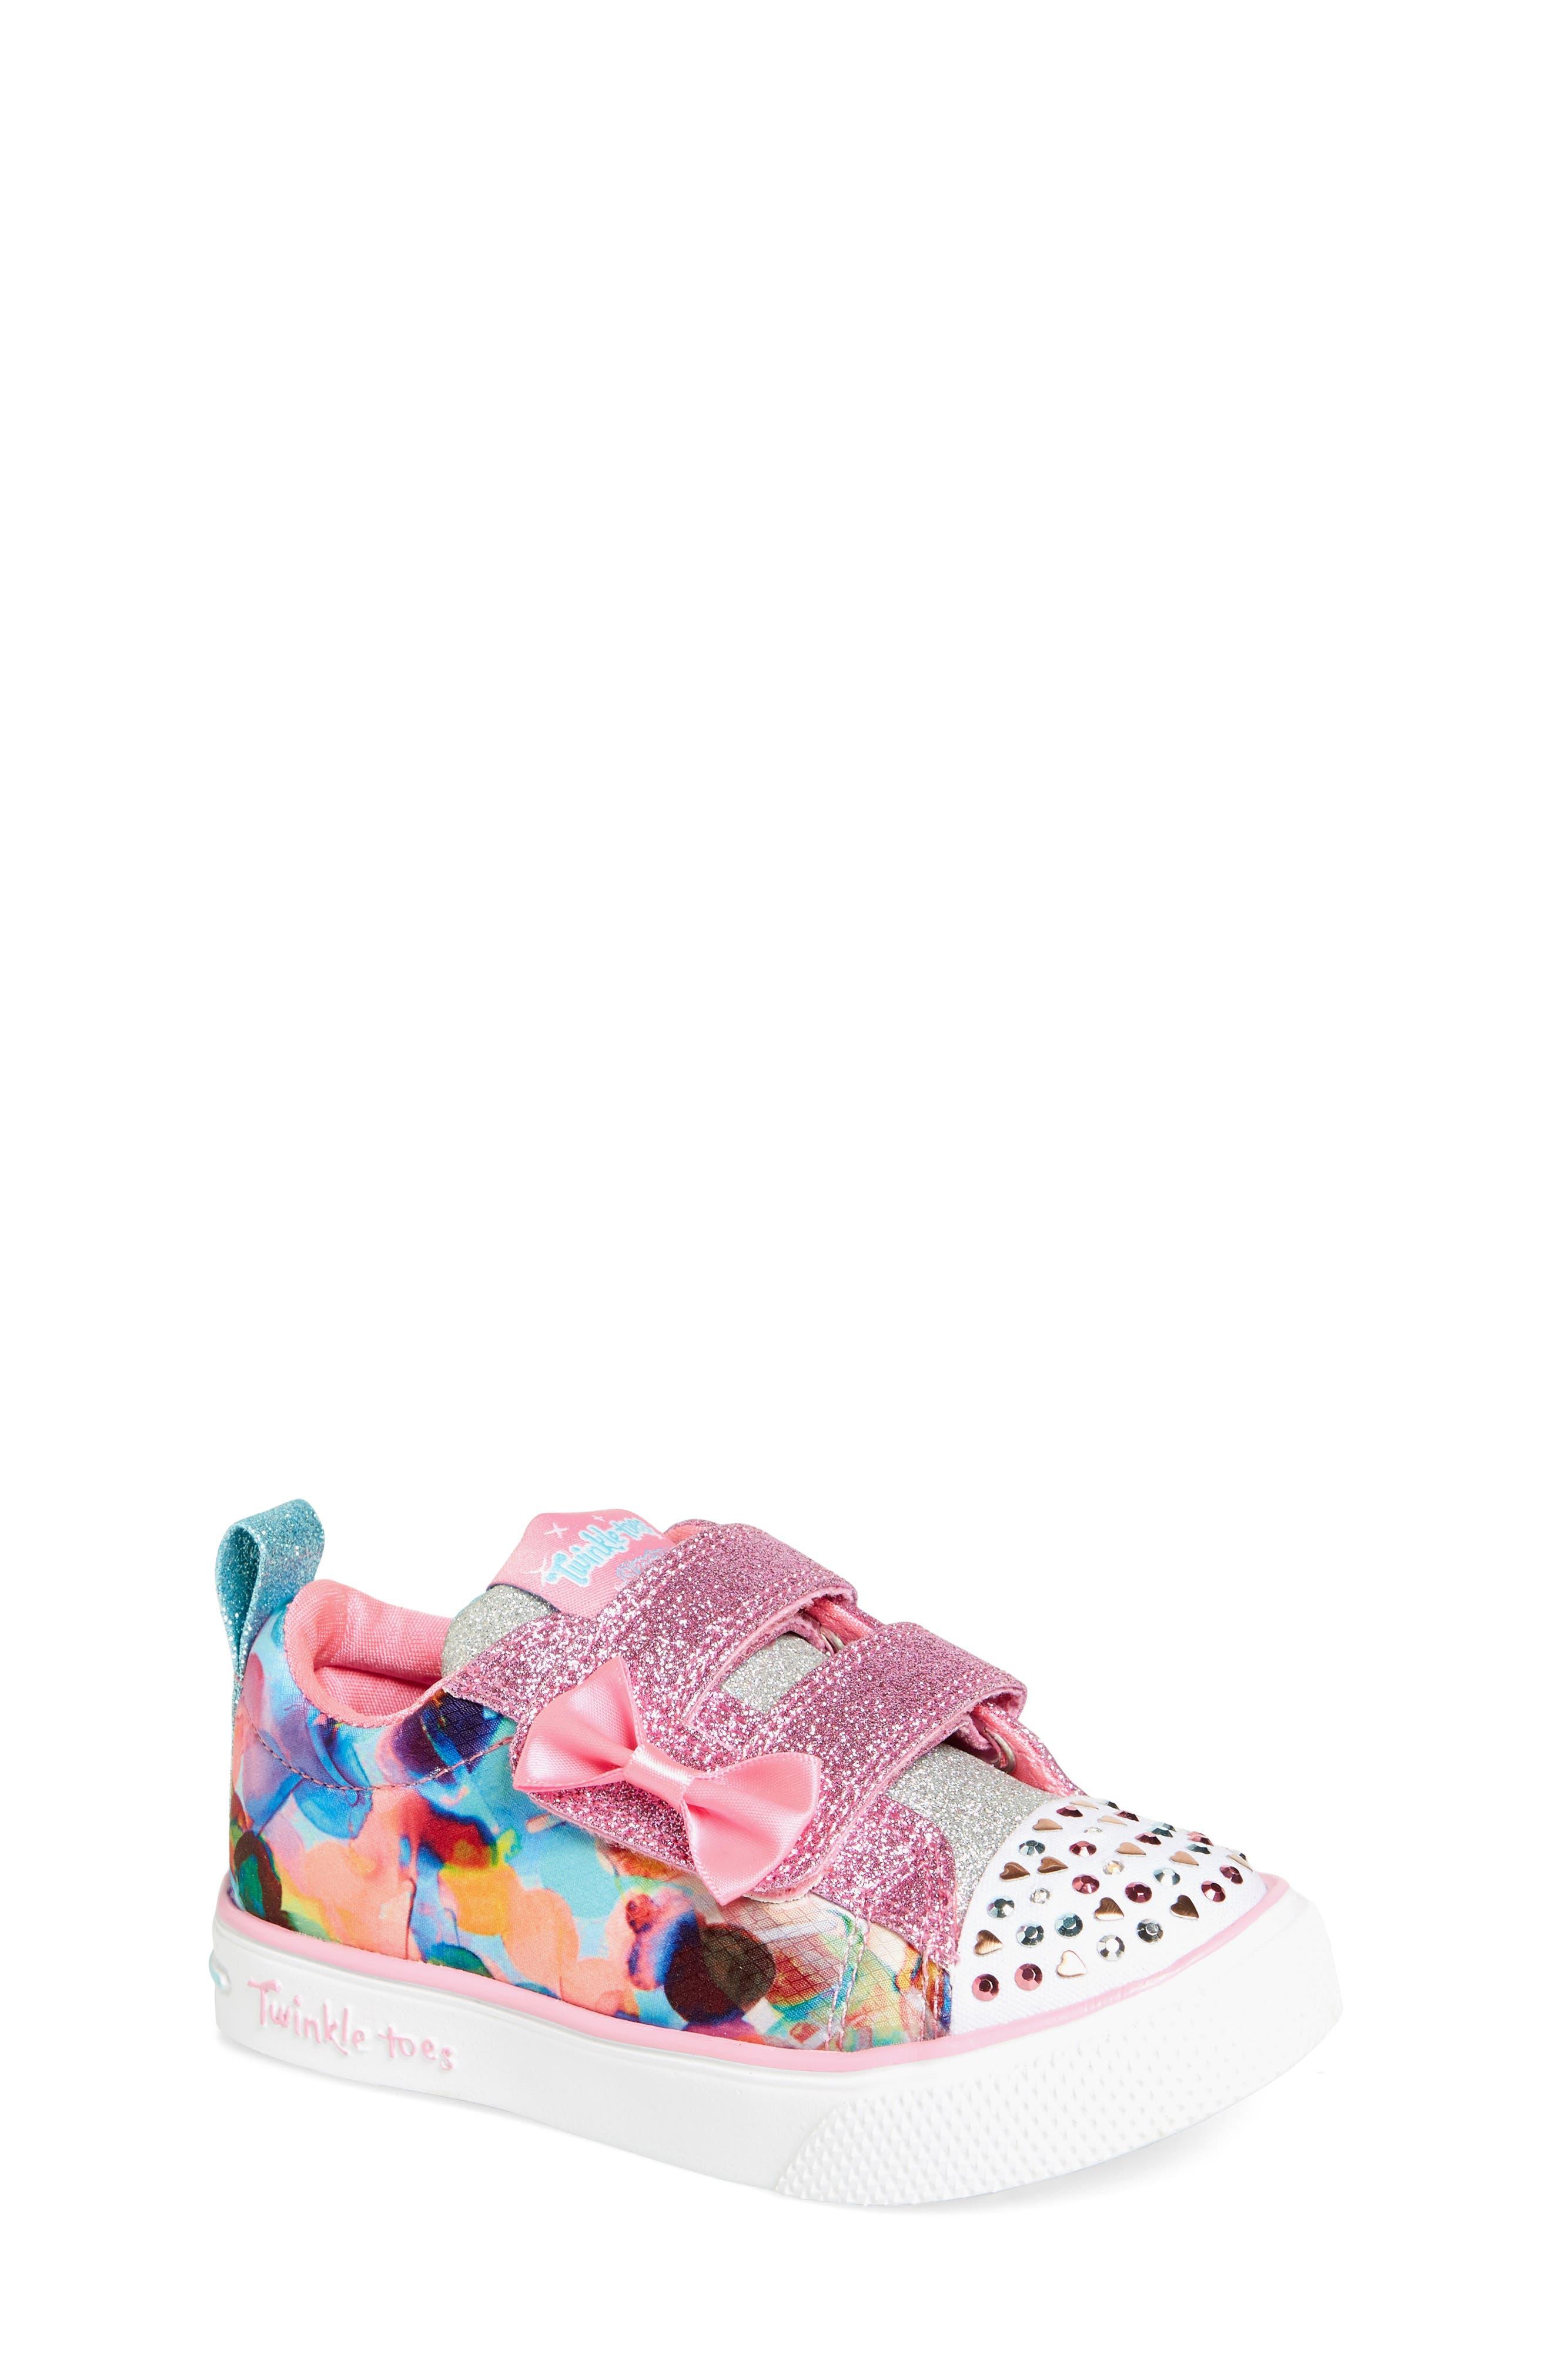 Twinkle Breeze 2.0 Princess Sneaker,                         Main,                         color,